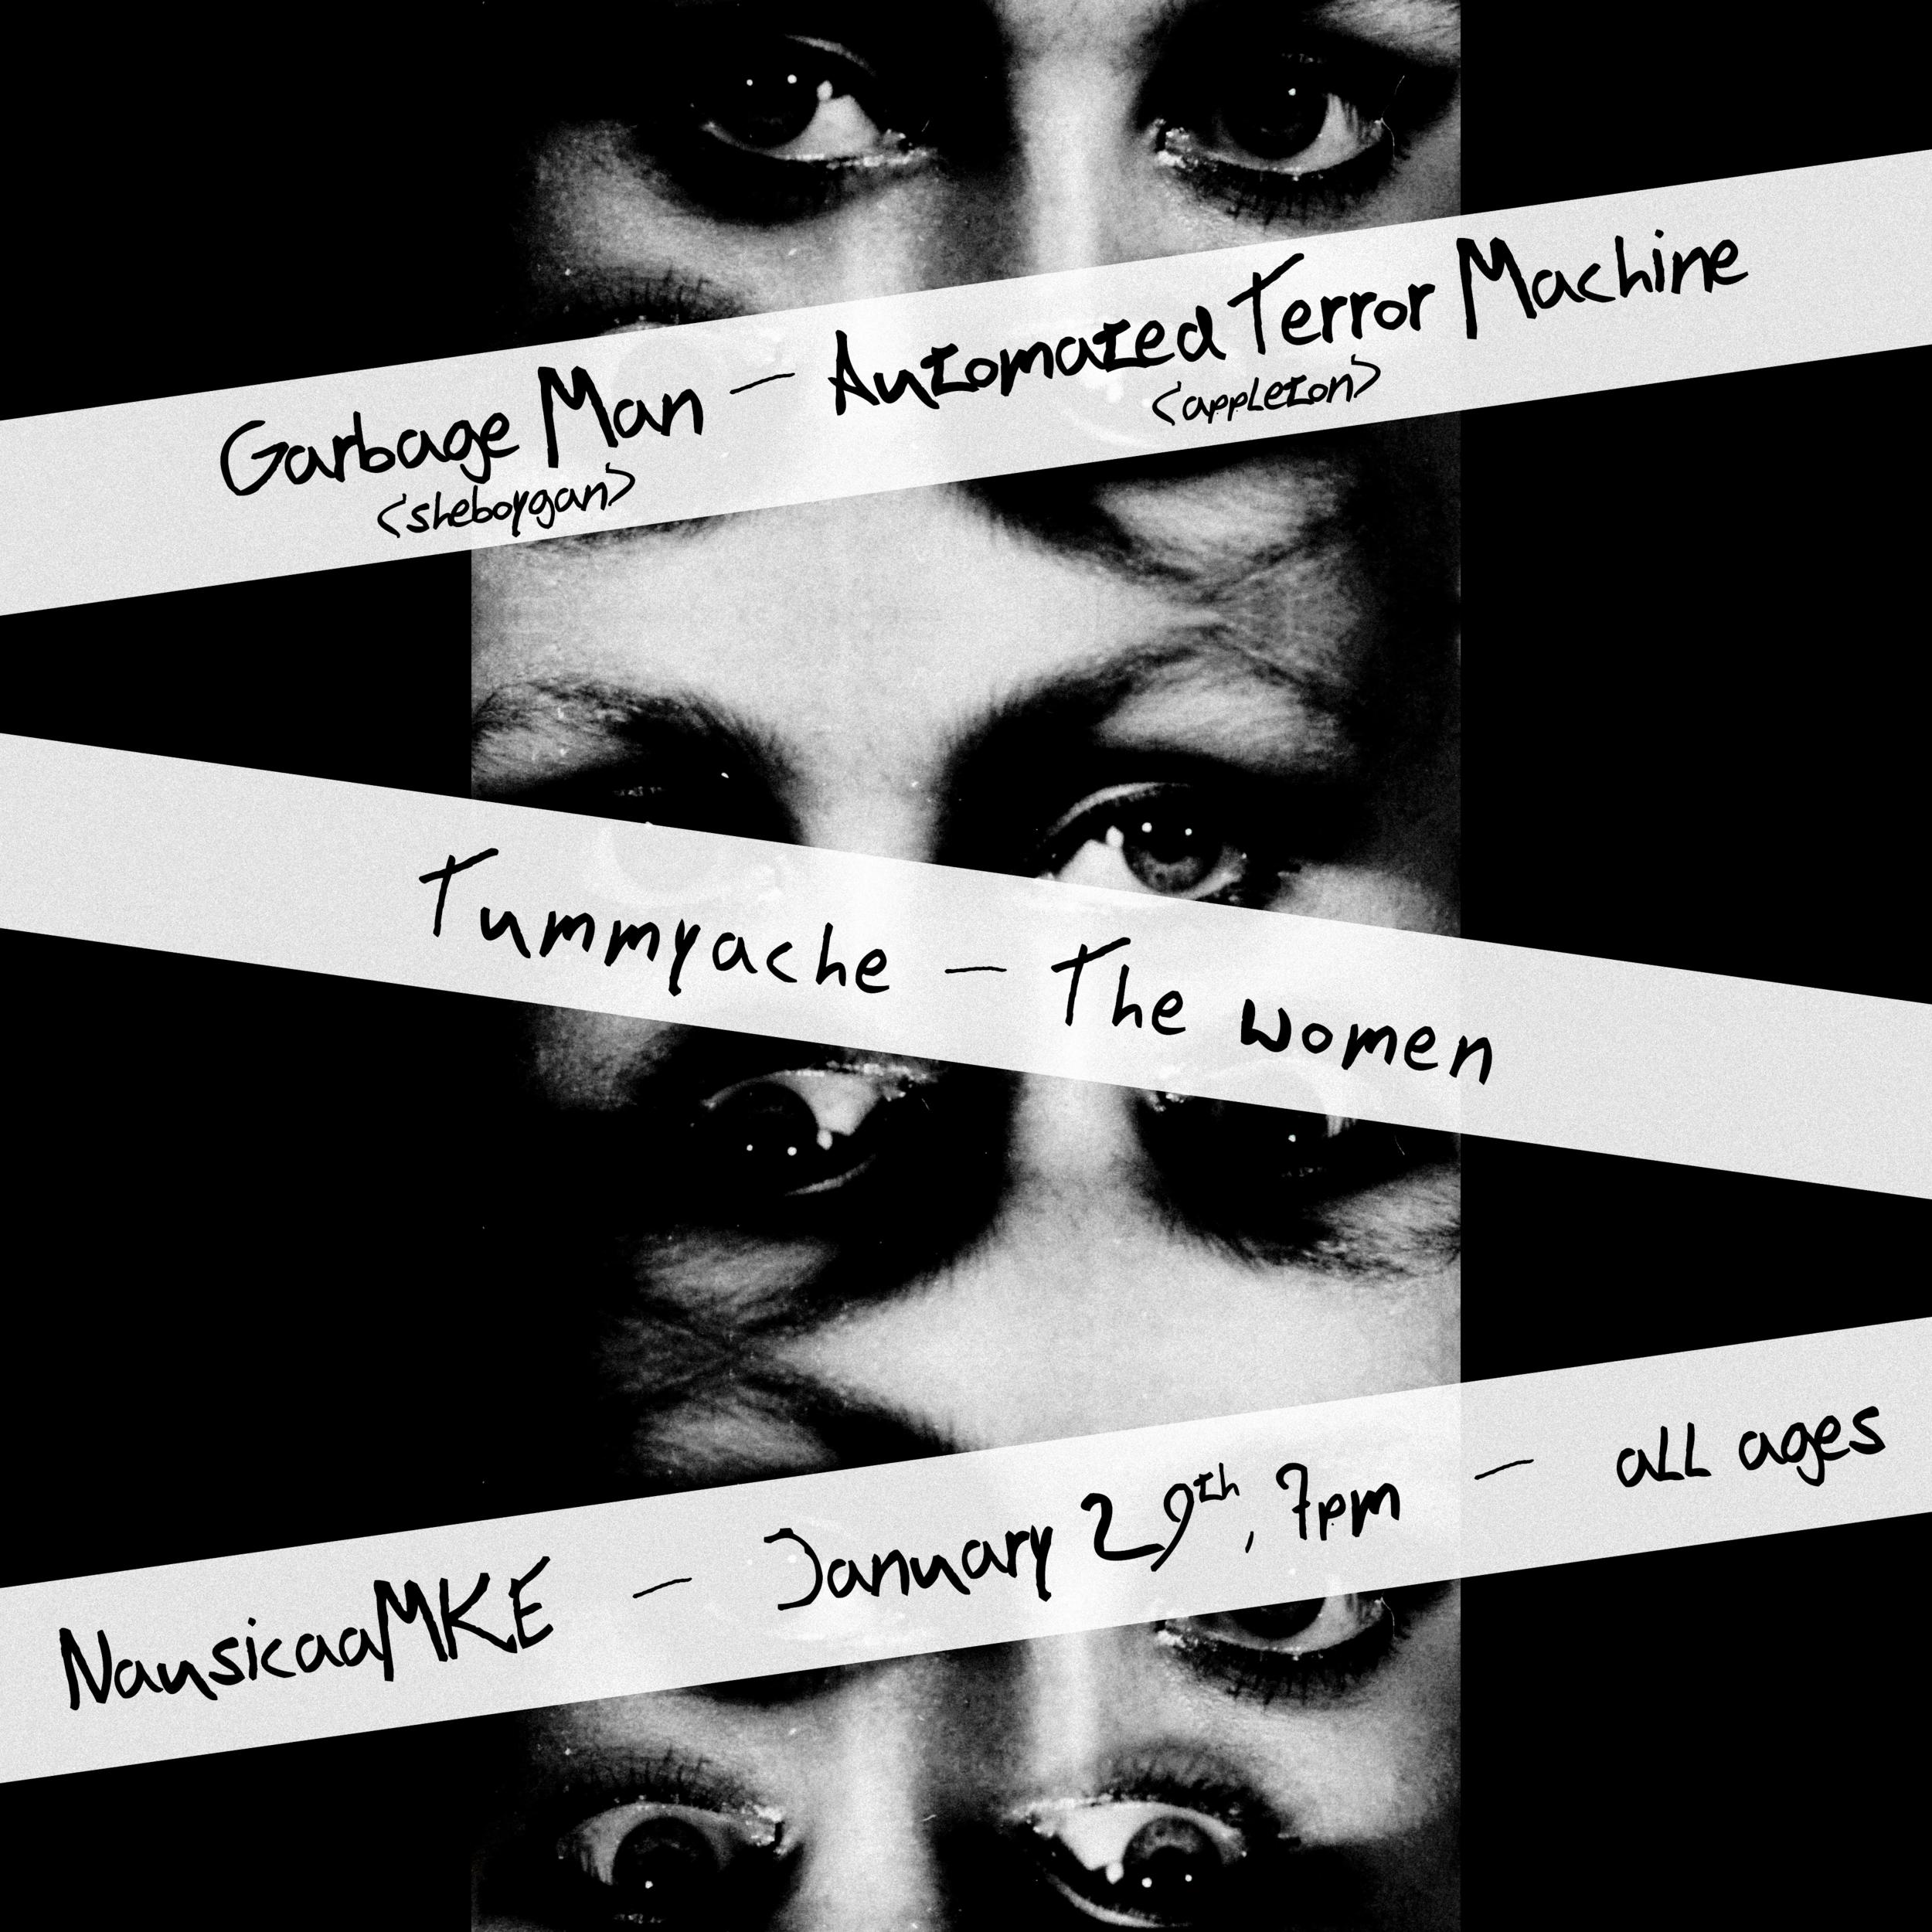 tummyache-garbage man-atm-the women (secondary edit).png